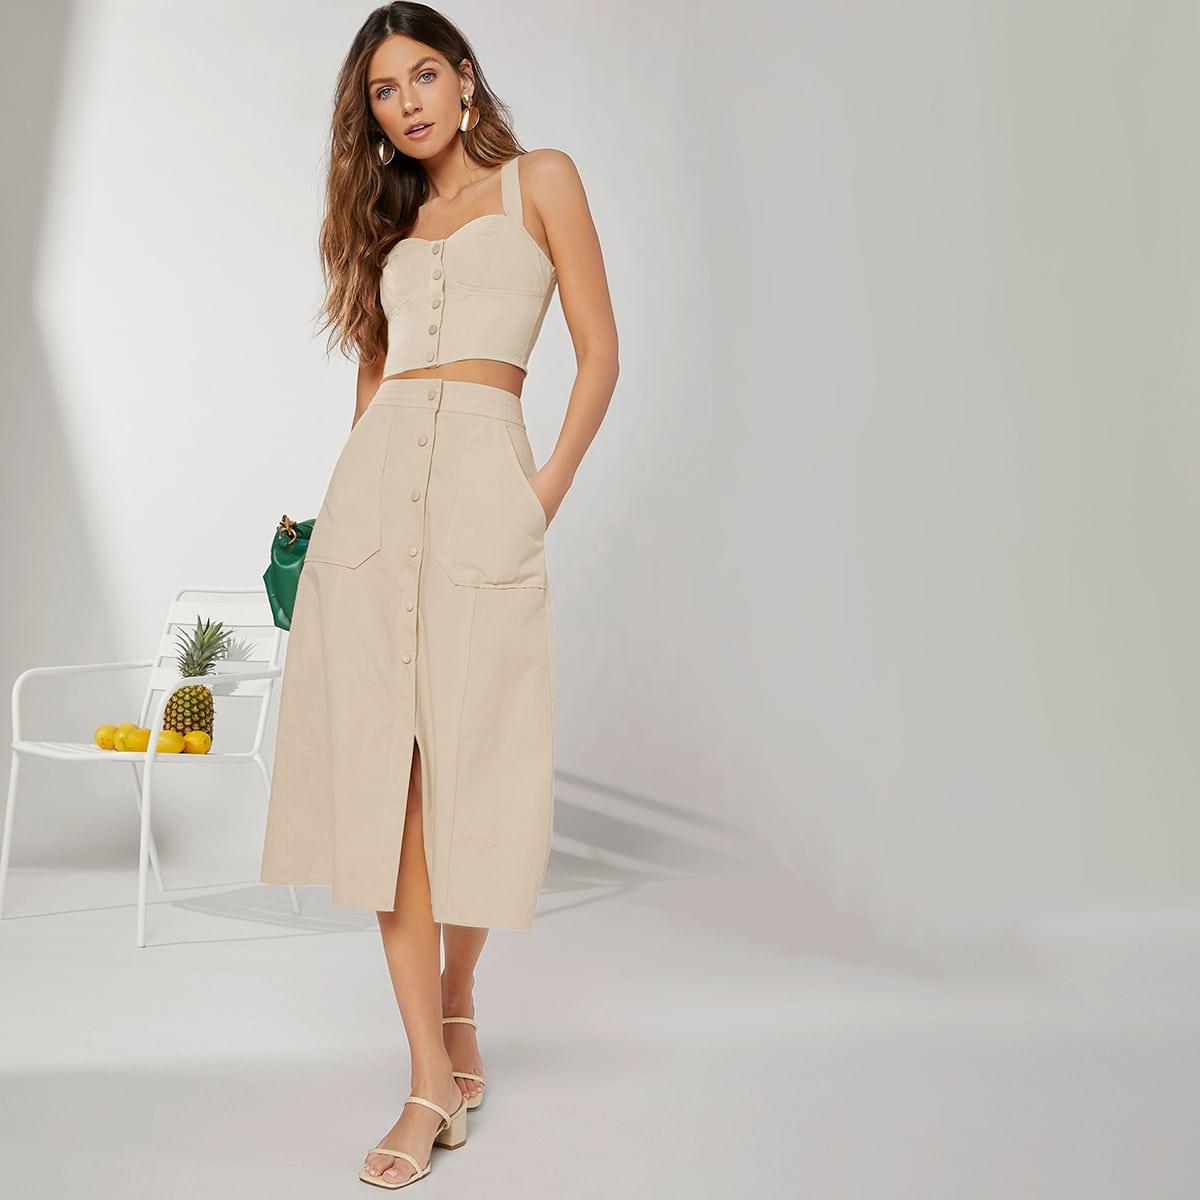 Solid Button Front Pocket Side Skirt